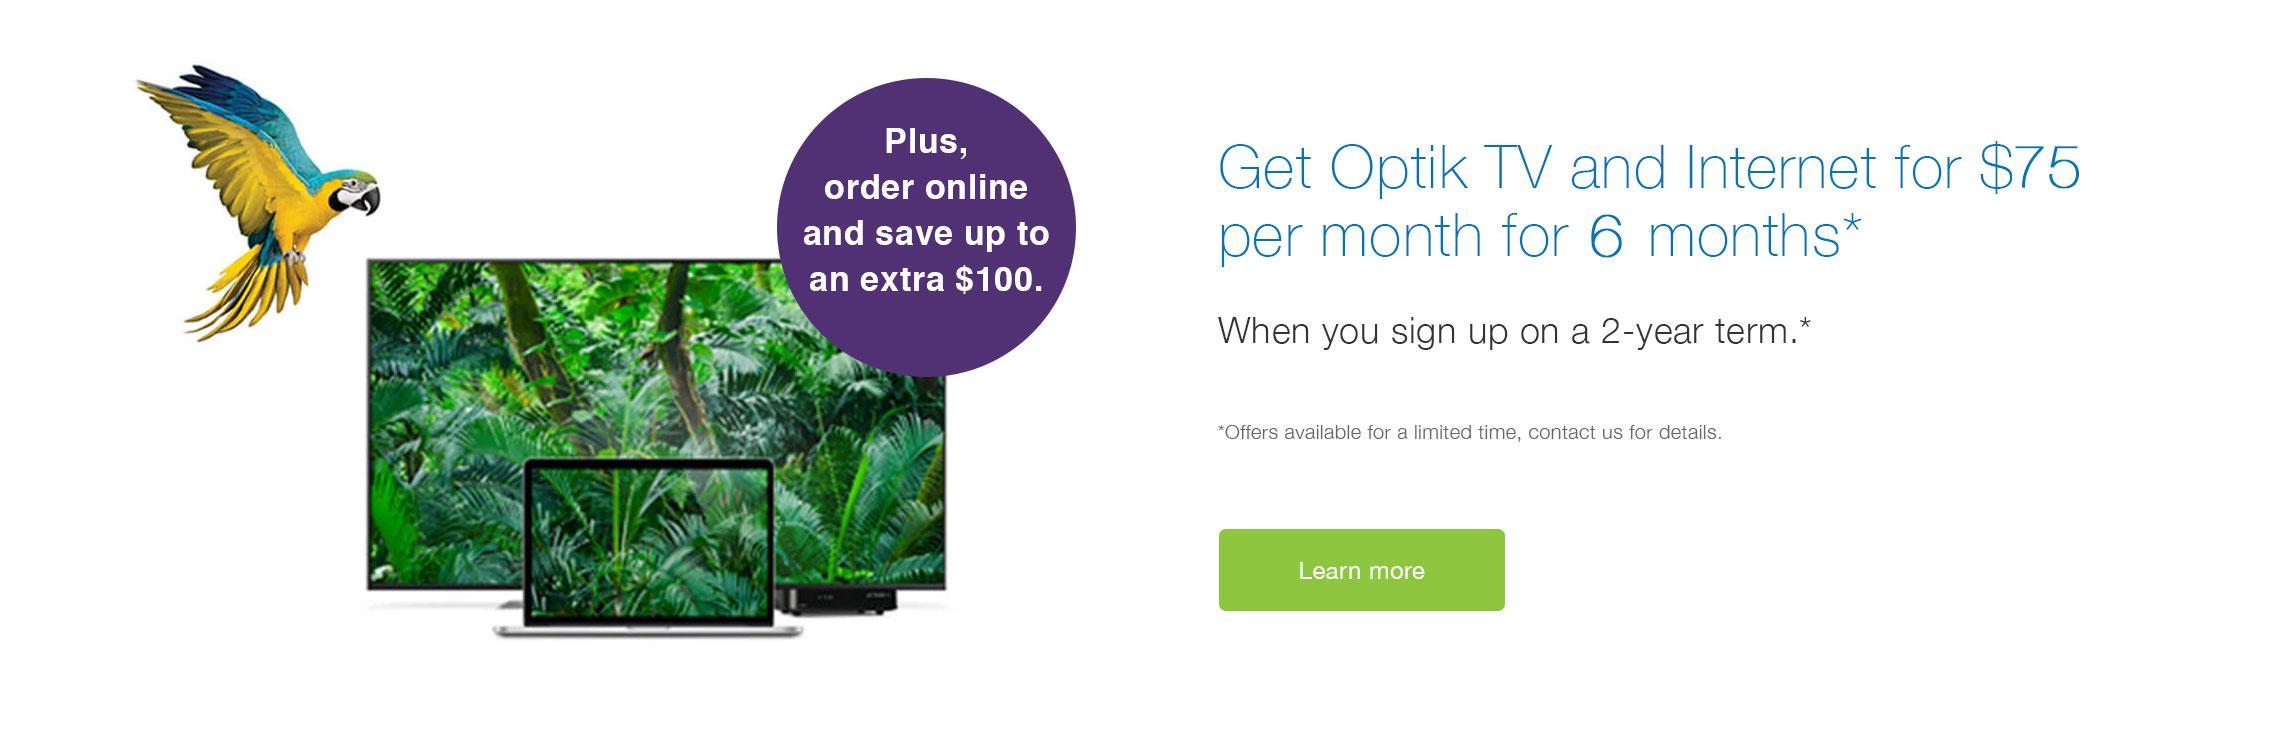 TELUS Optik TV, Essentials, 6 Theme Packs and Internet 50 for $50